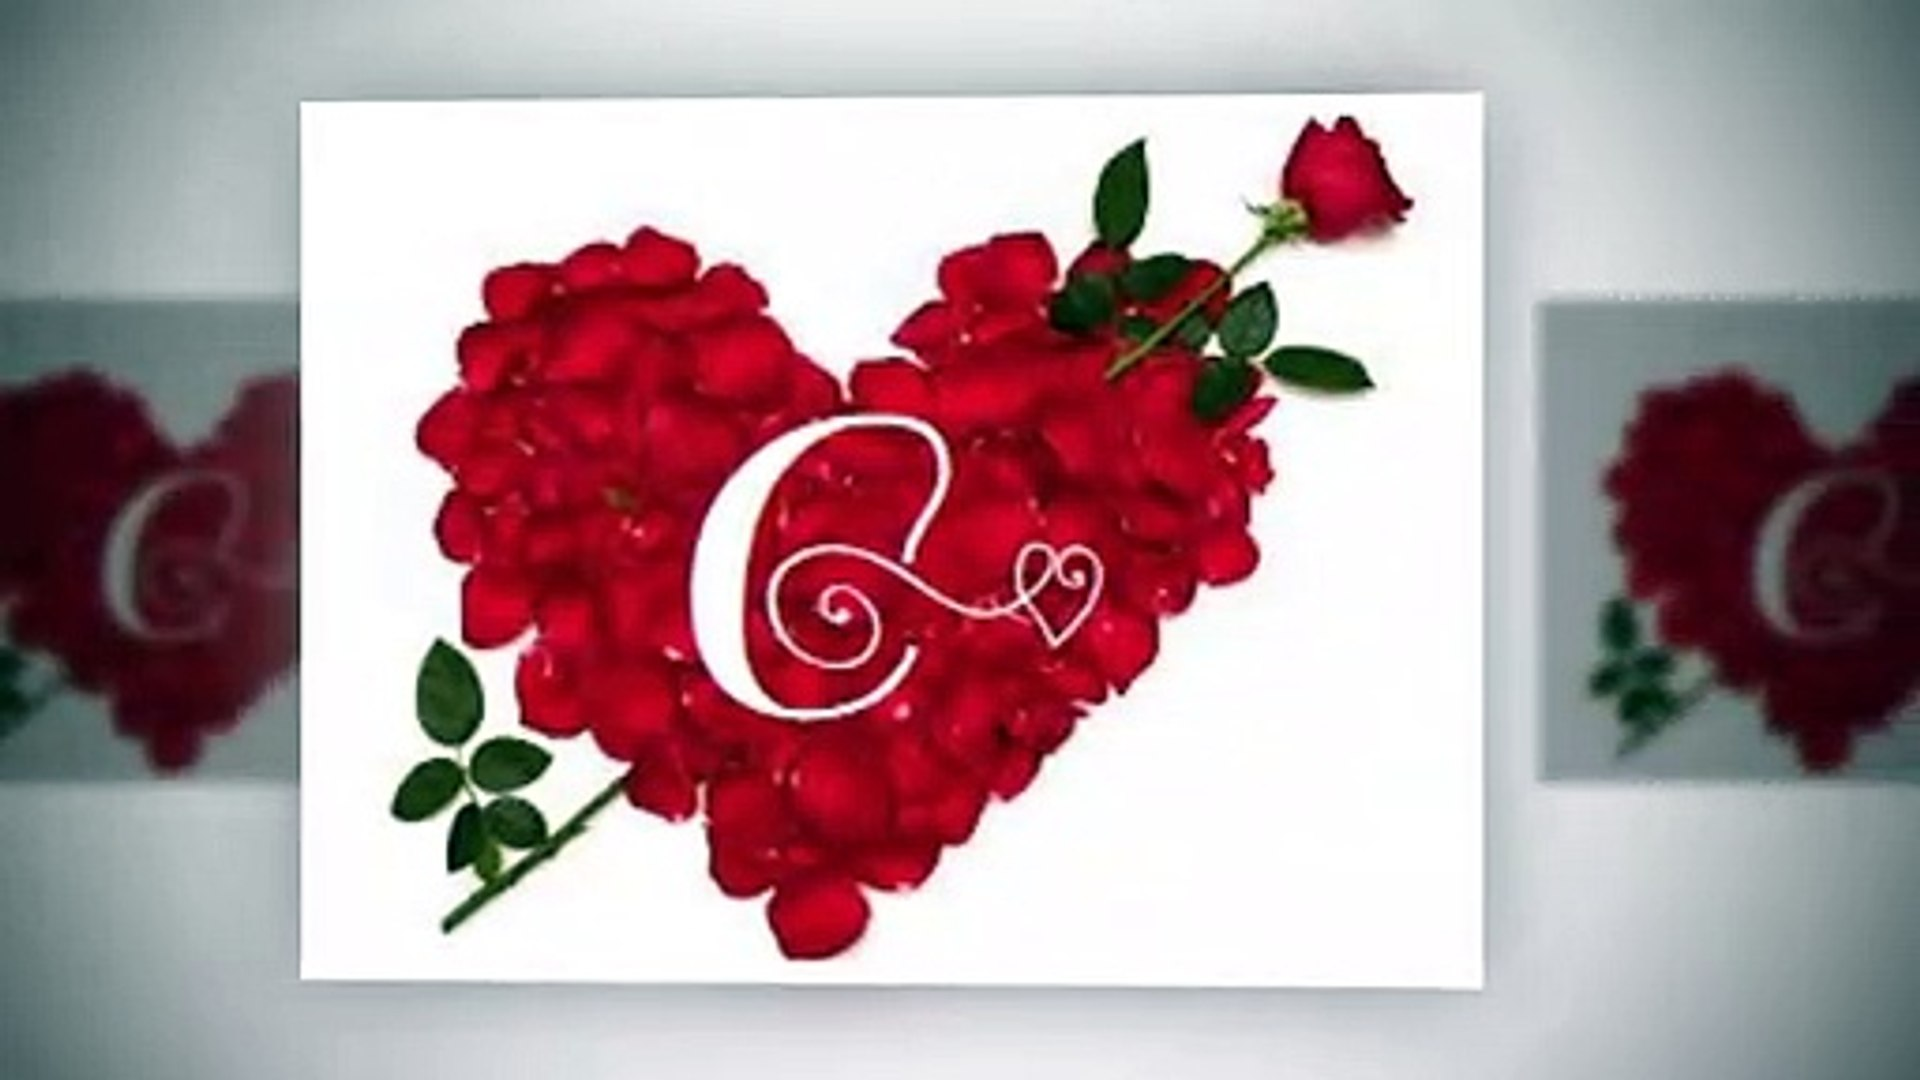 C Letter Whatsapp Status C Name Whatsapp Status With Cute Romantic Song Video Dailymotion